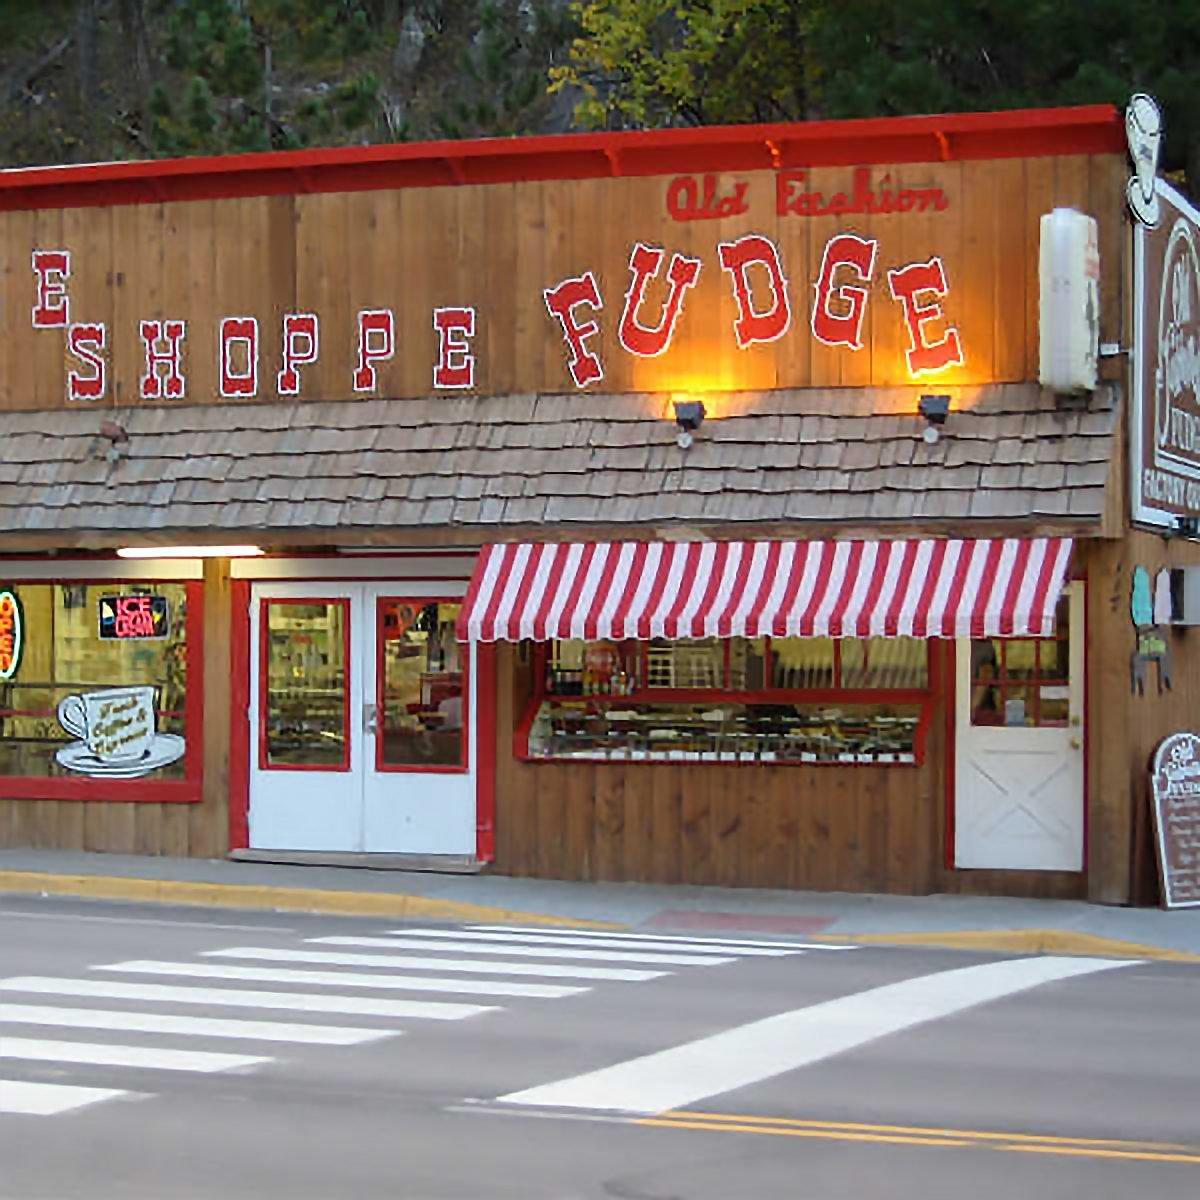 The Best Fudge Shop in South Dakota - Turtle Town